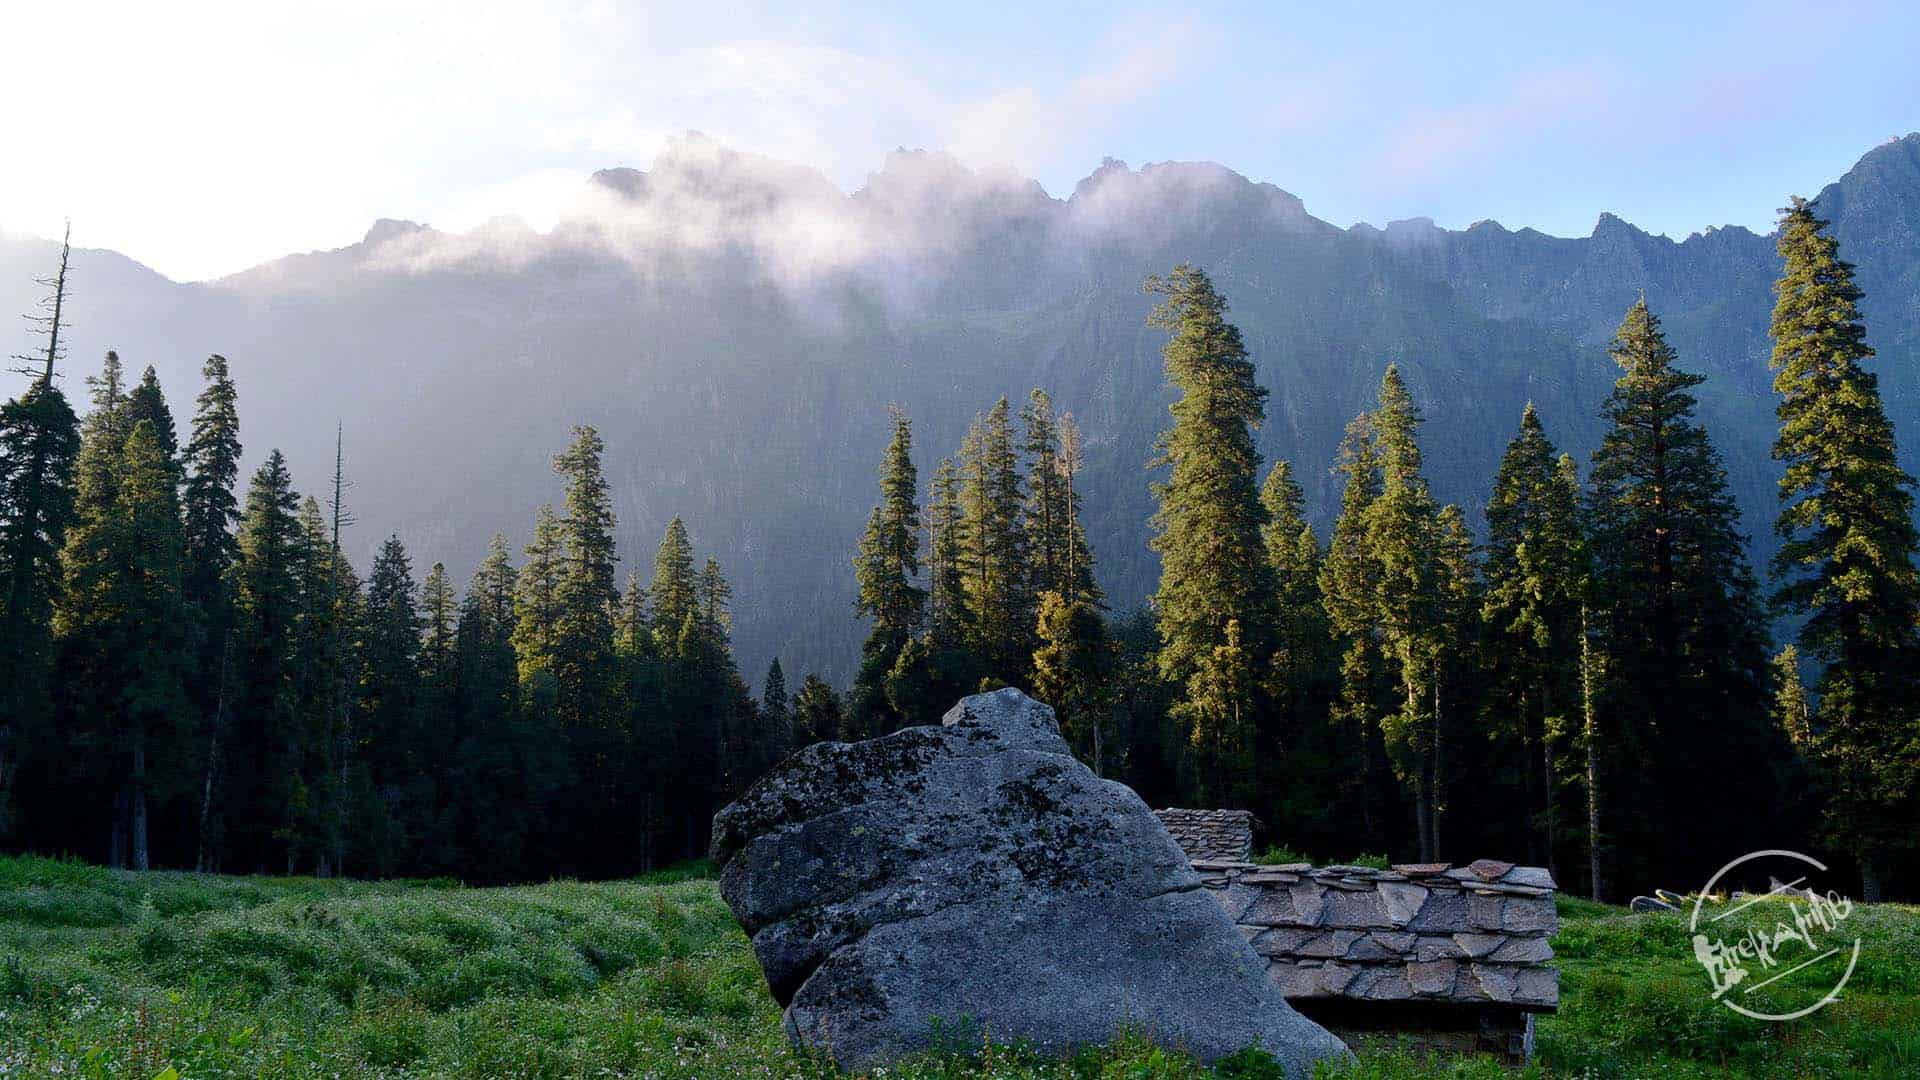 Chandernahan lake Trekking - Rohru , shimla